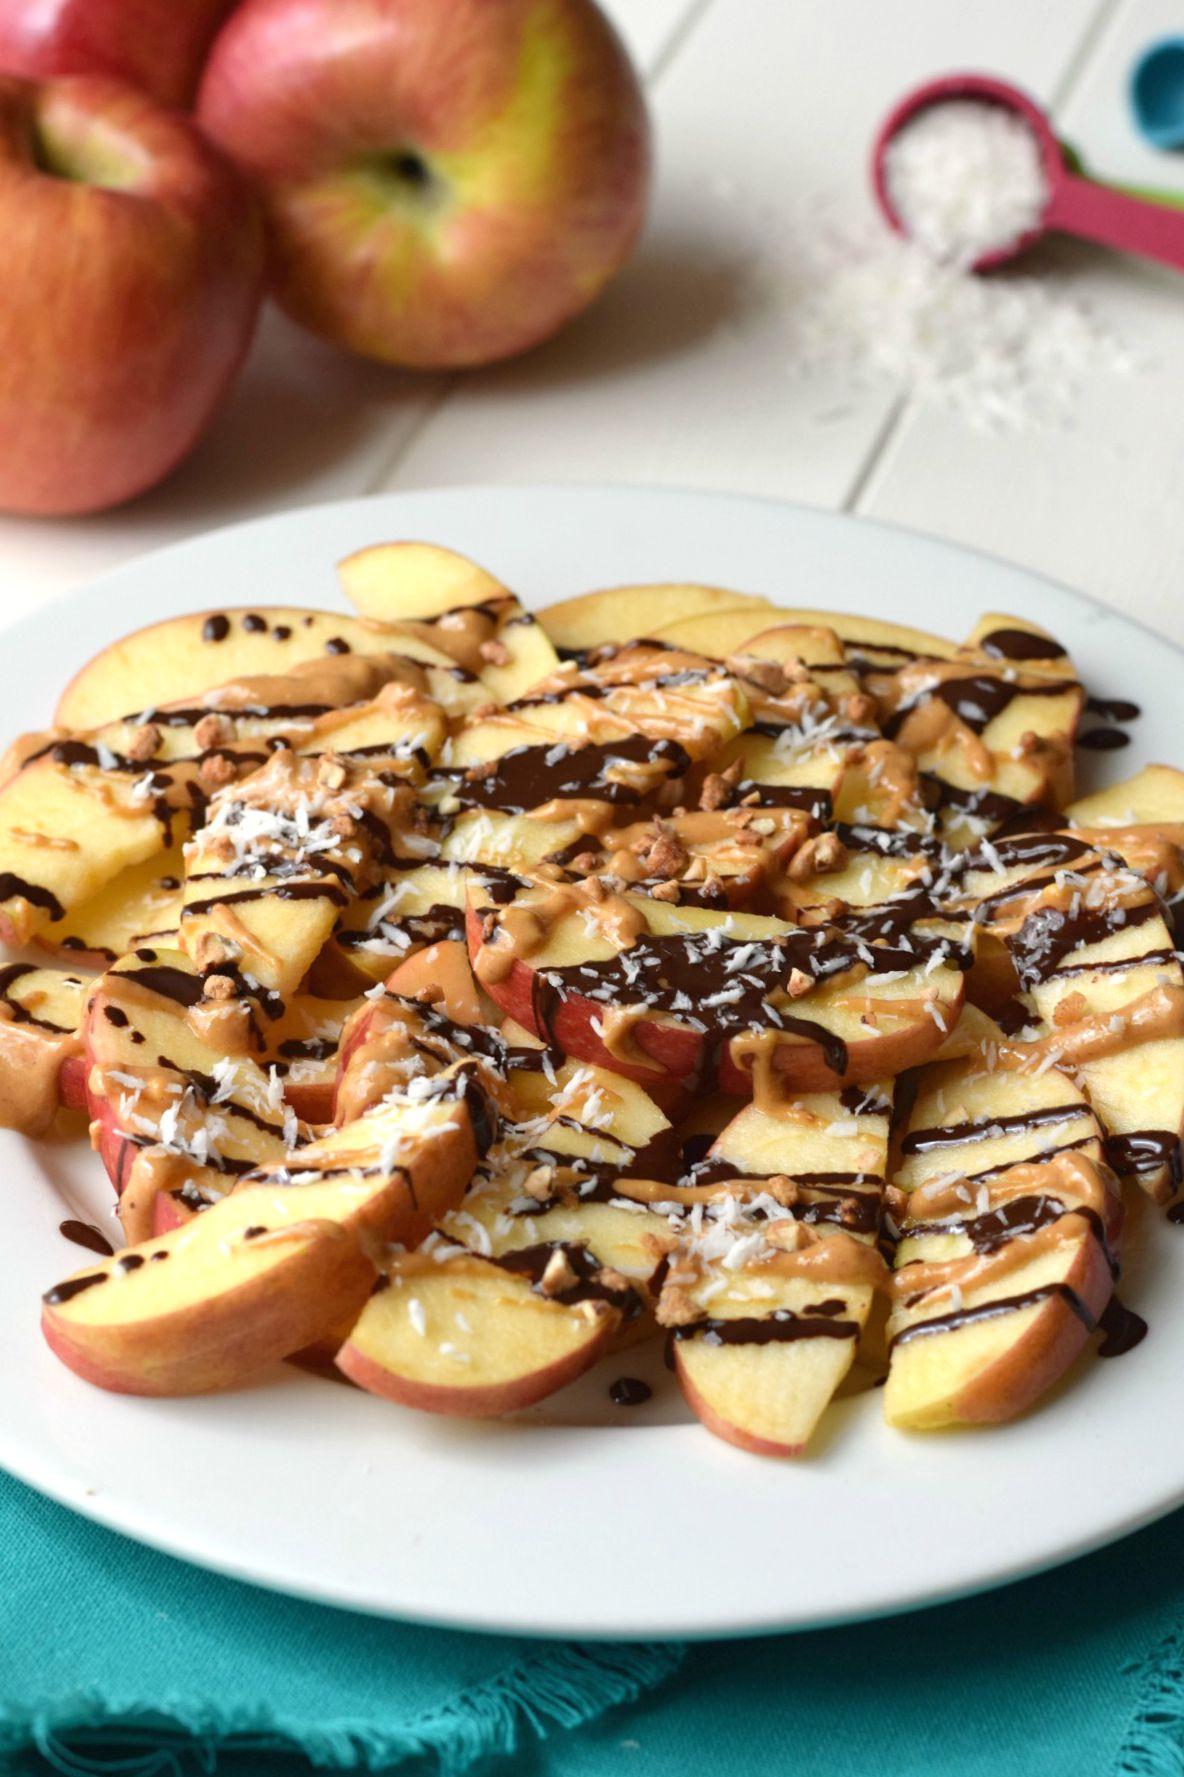 Healthy Peanut Butter Snacks  Dark Chocolate Peanut Butter Apples Feel Great in 8 Blog